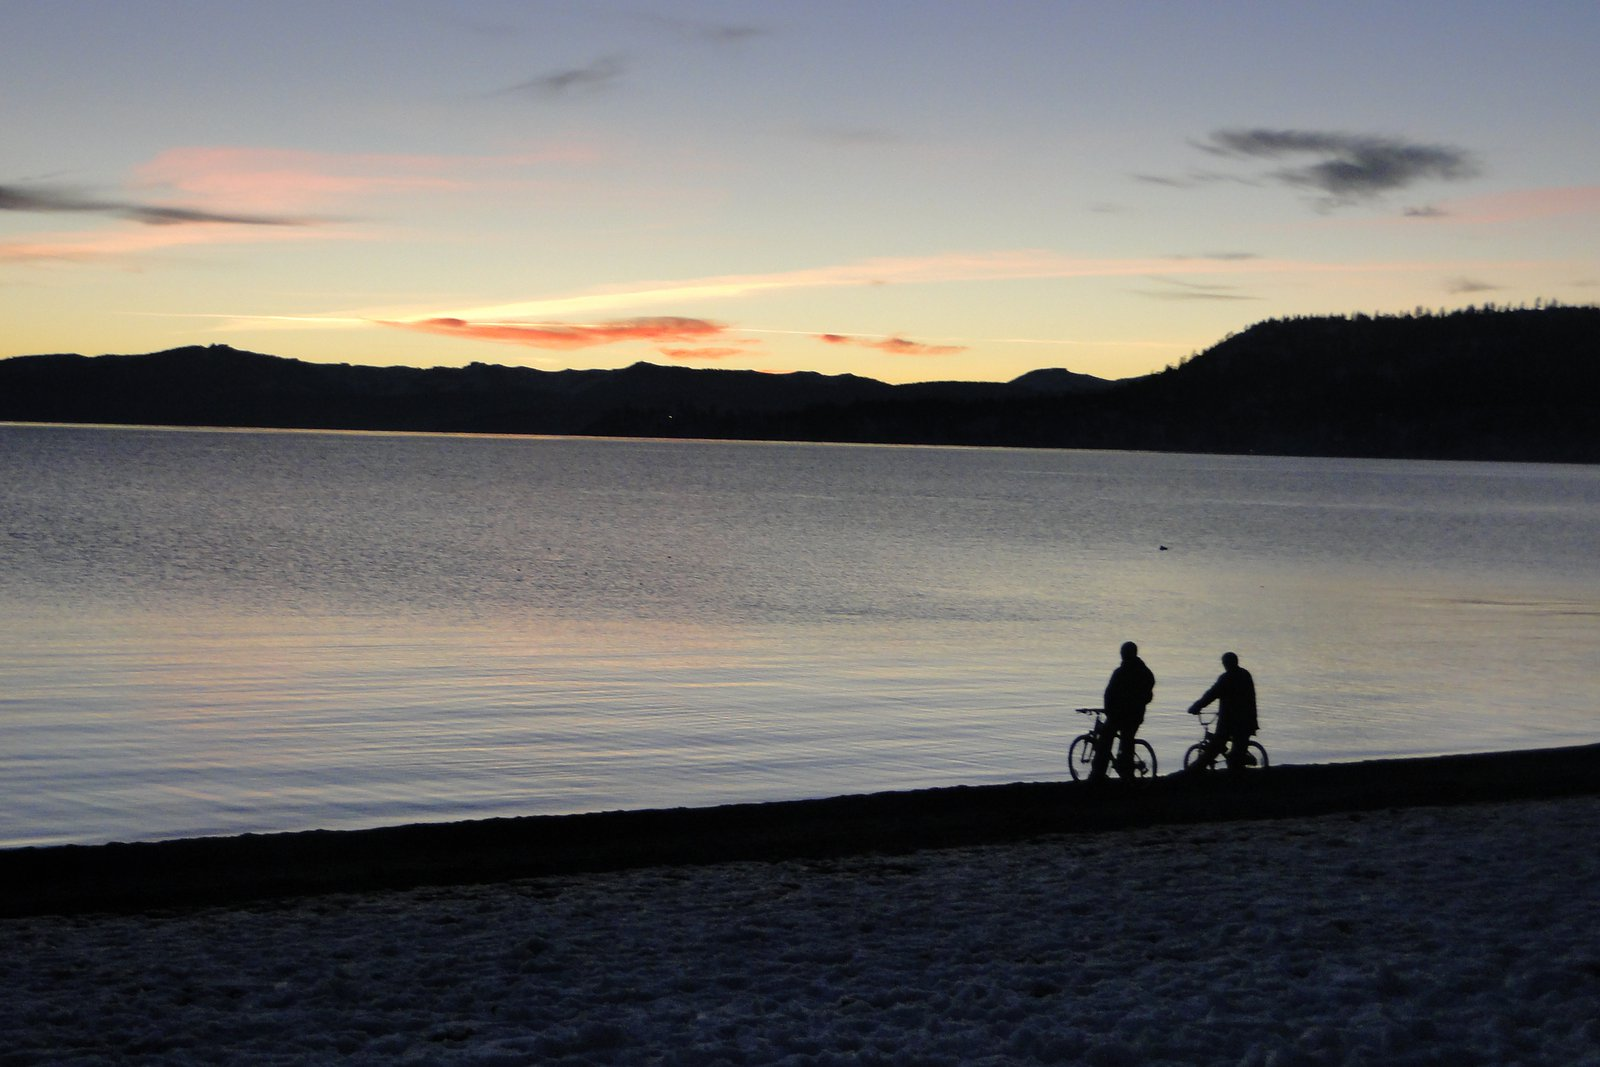 Night in Tahoe